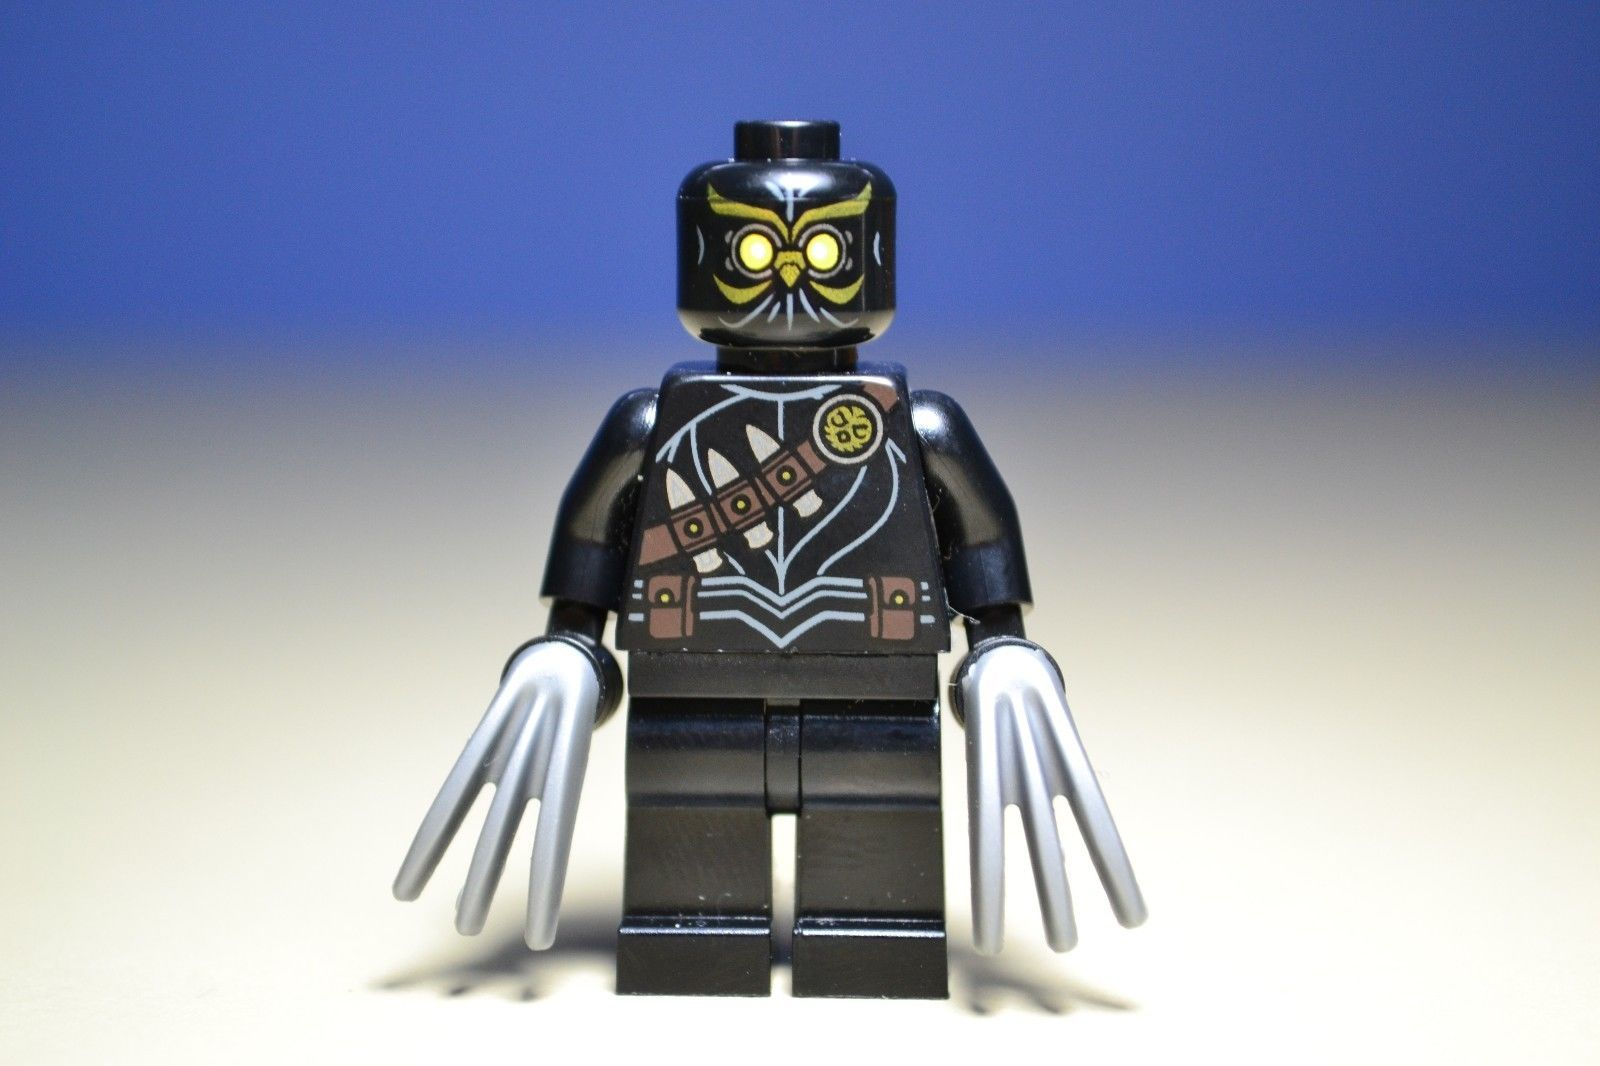 New Minifigure Custom Lego Harley Quinn with Baseball Bat Character DC Comics